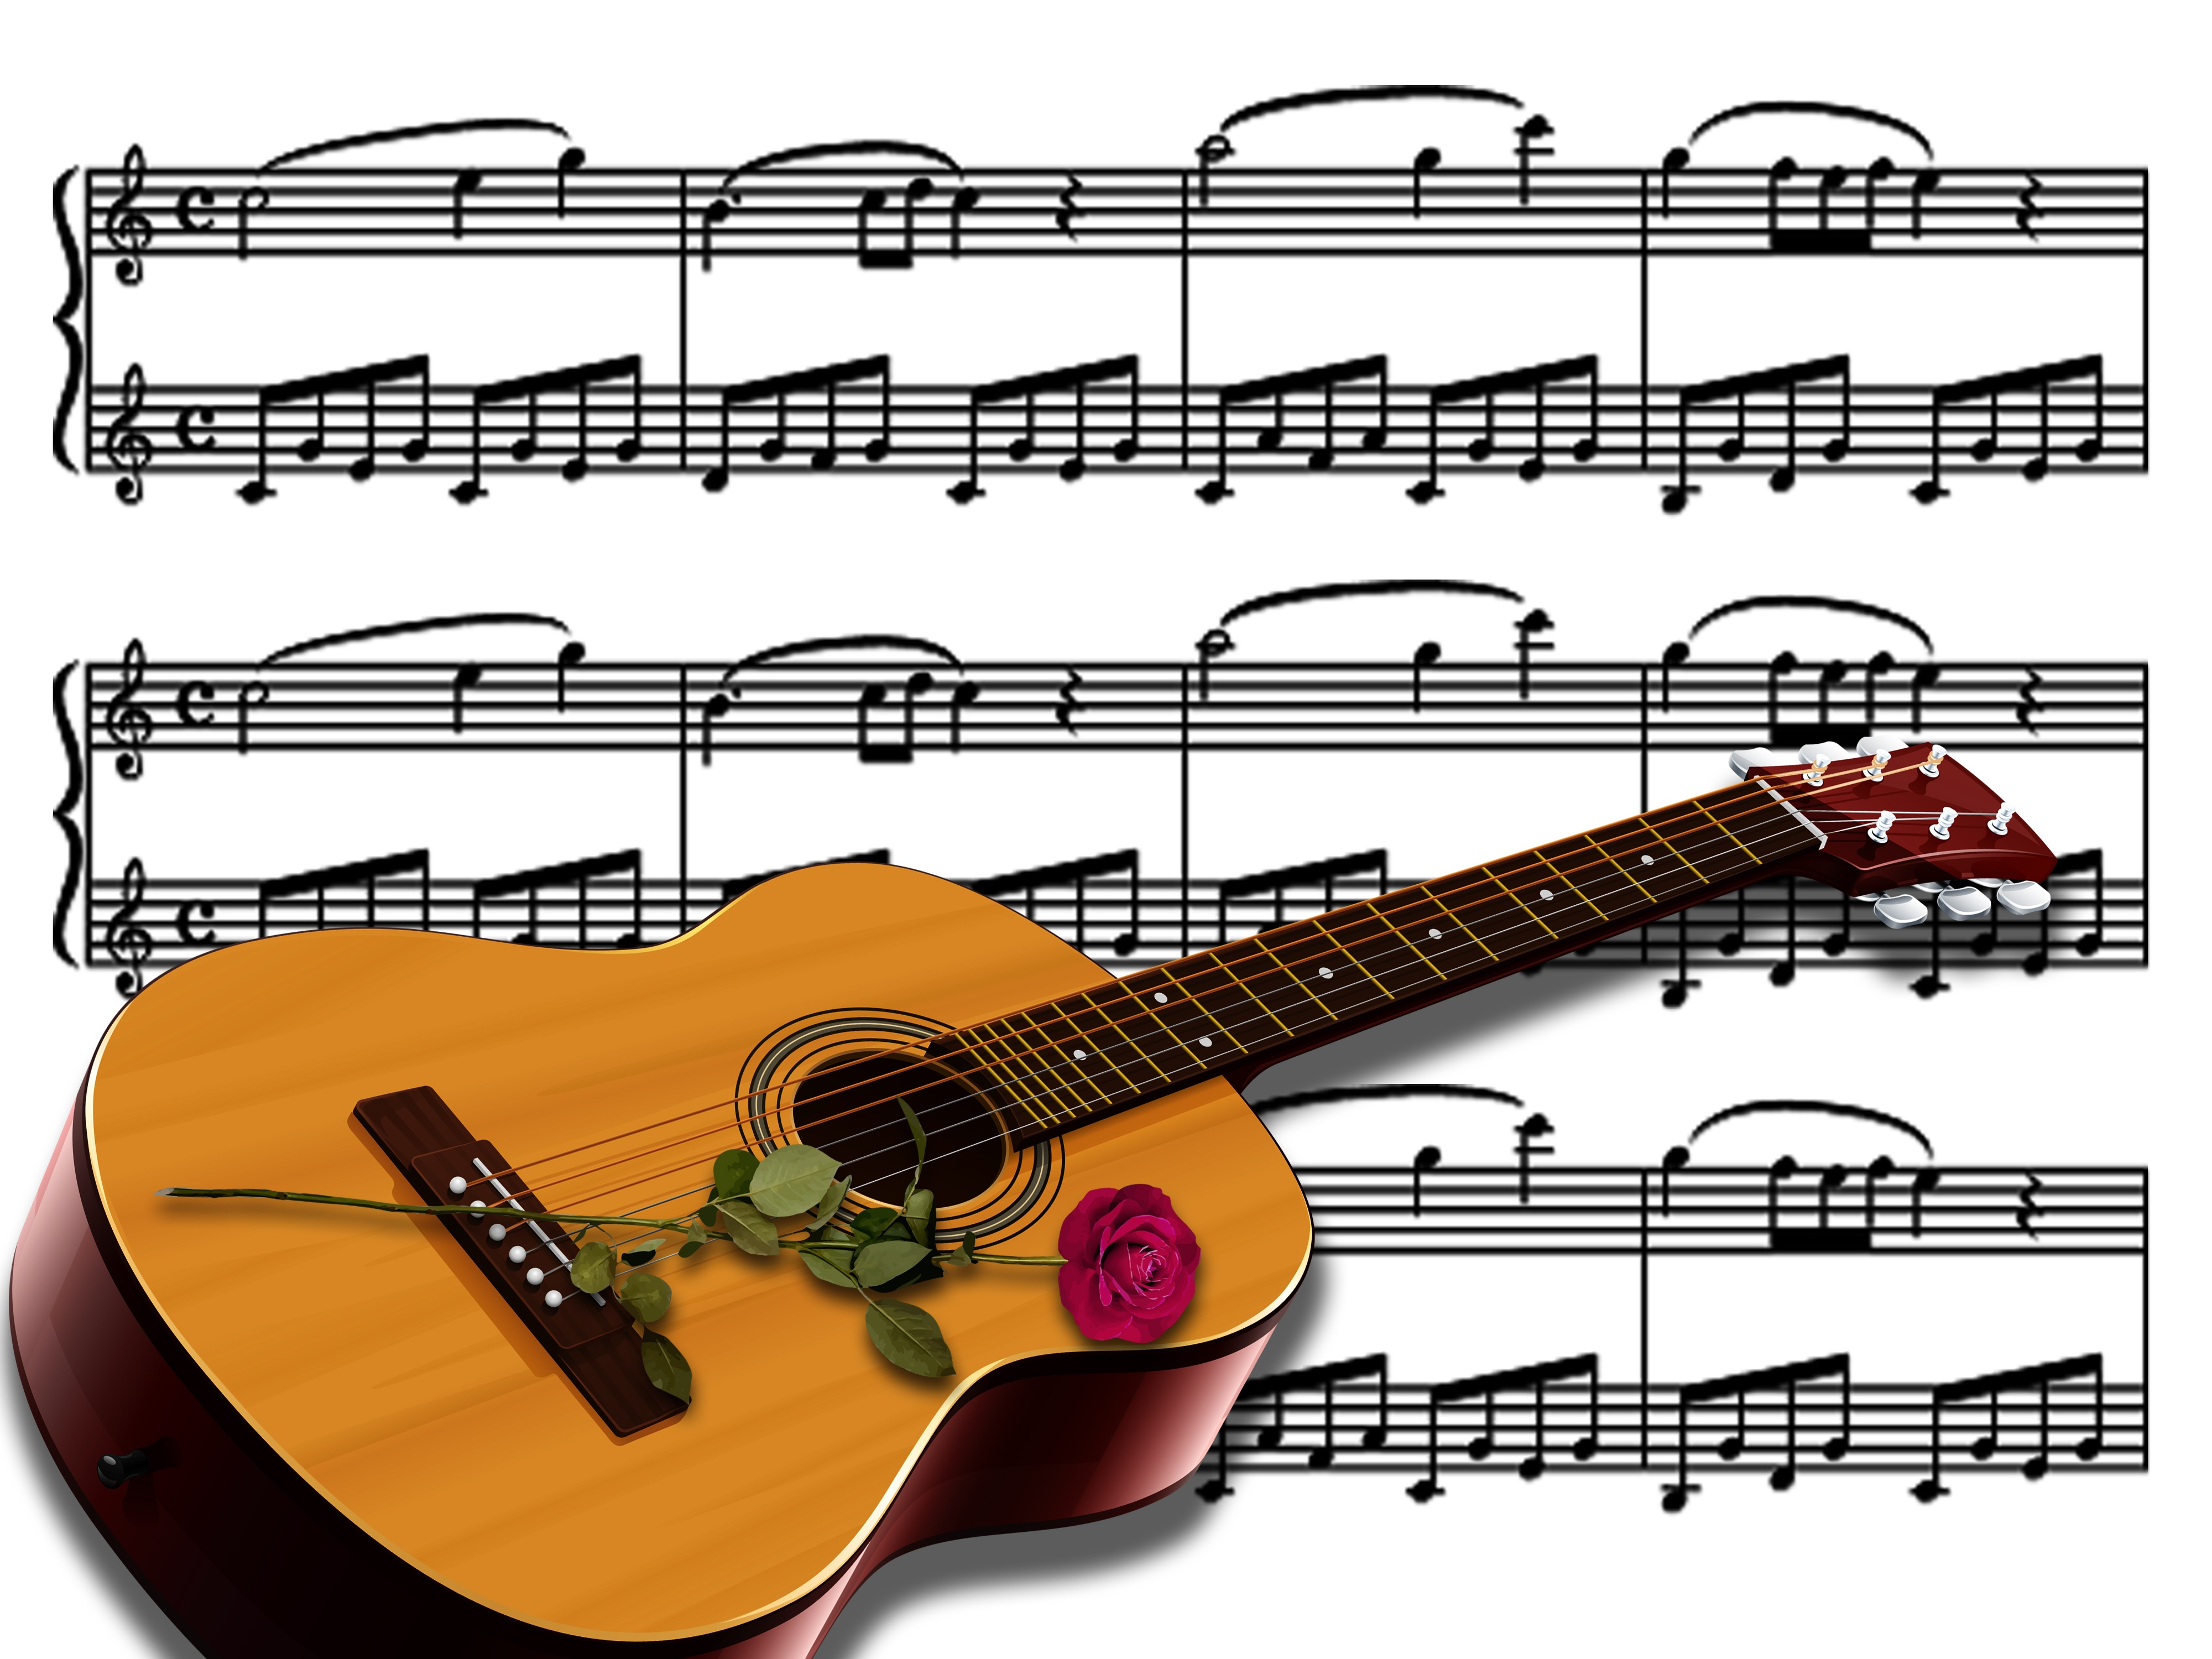 Guitarra 4k Ultra Fondo De Pantalla Hd Fondo De Escritorio 4000x3000 Id 939847 Wallpaper Abyss